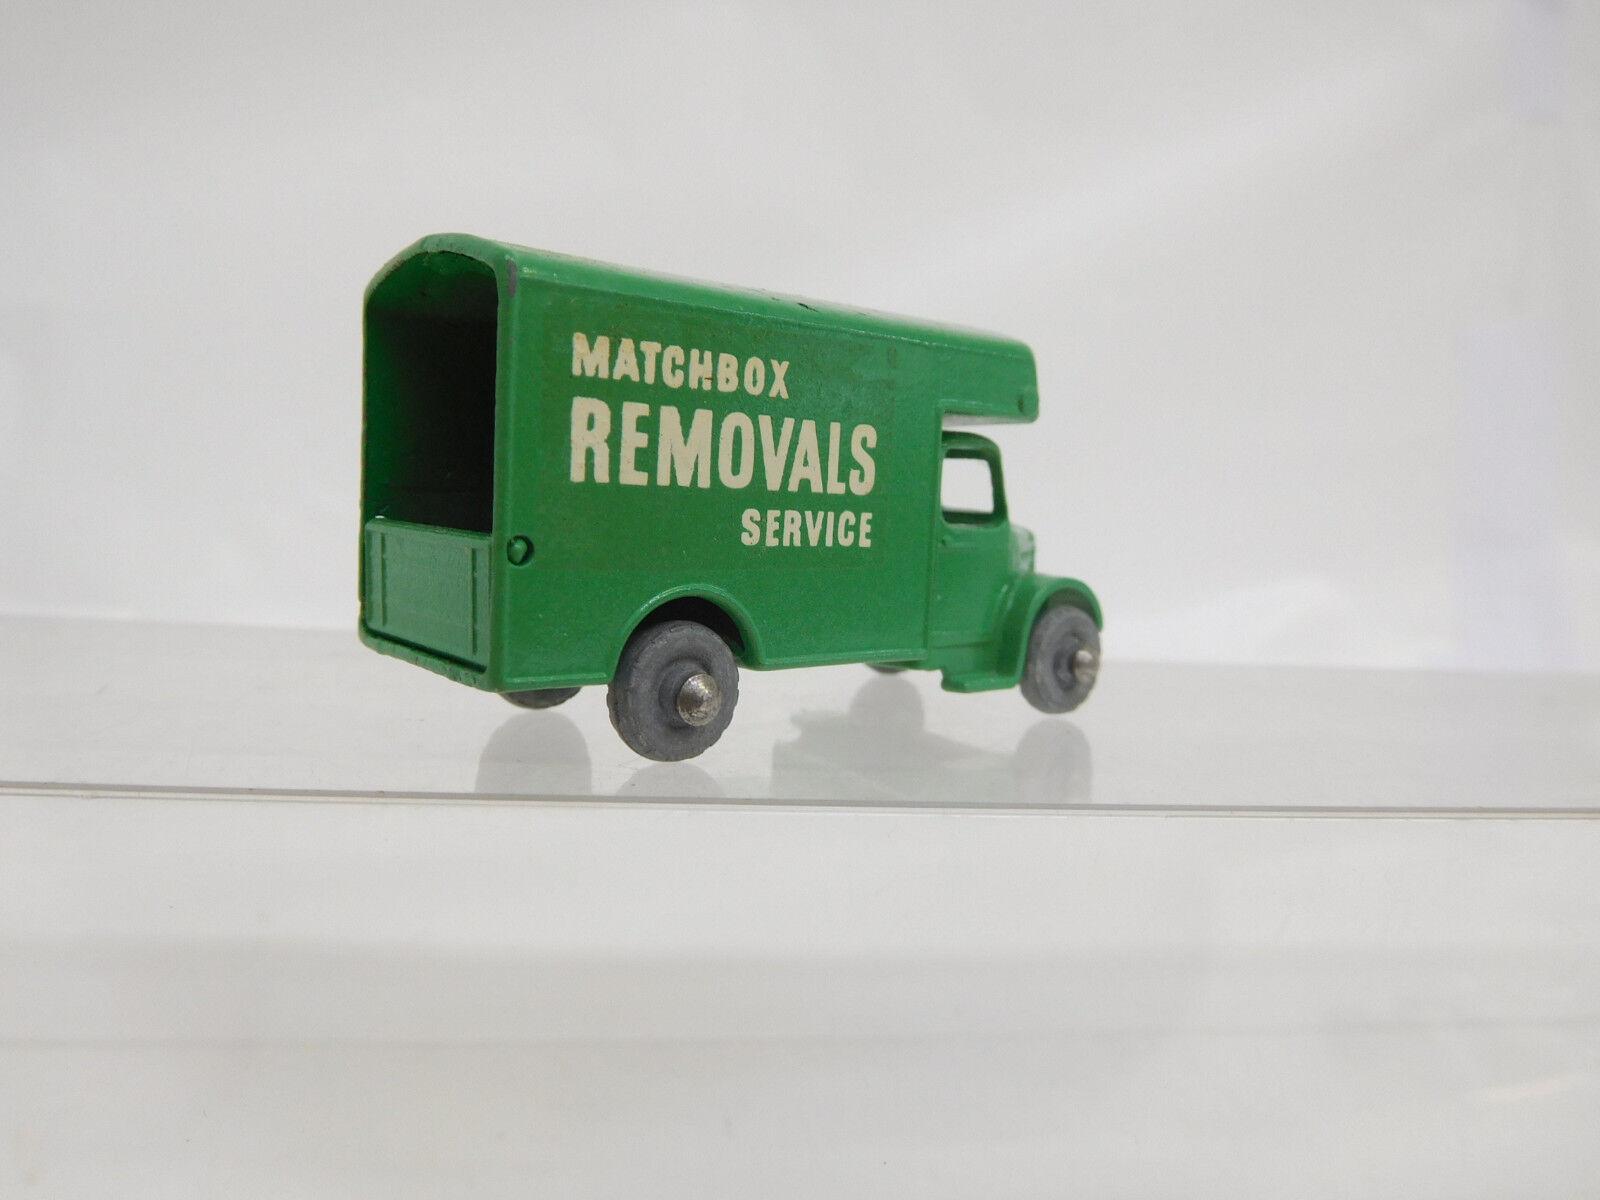 Mes-51182 LESNEY MATCHBOX Removals Removals MATCHBOX service très bon état 006299